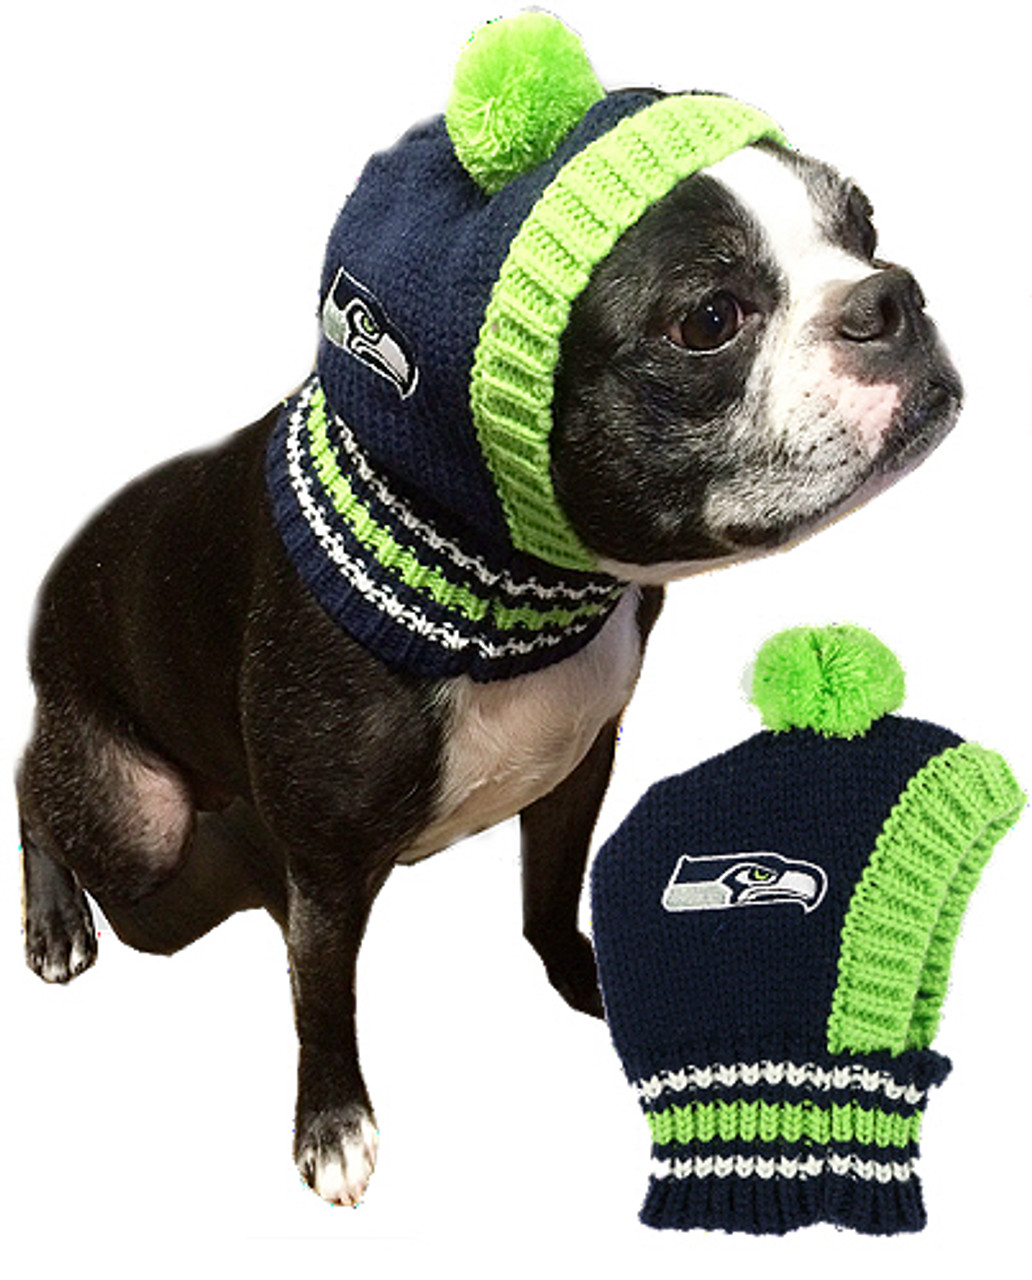 8522d0728 NFL Seattle Seahawks Knit Dog Ski Hat | Hip Doggie at PupRwear | GW ...